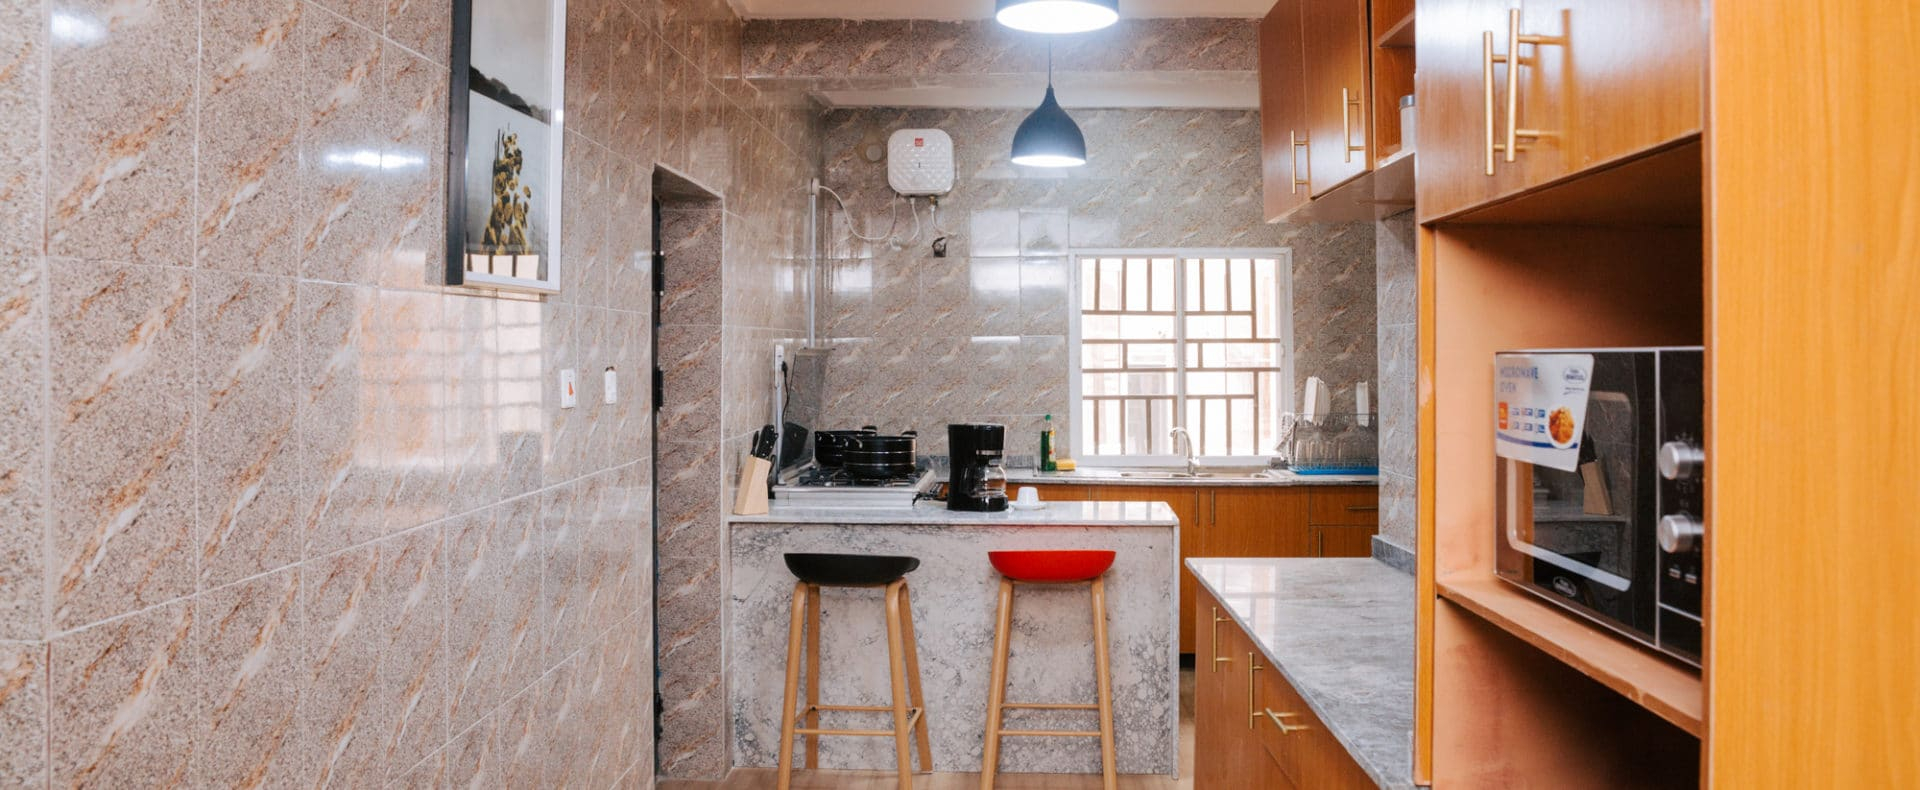 Retro Minimalist 3br Apartment By Utobert At Life Camp